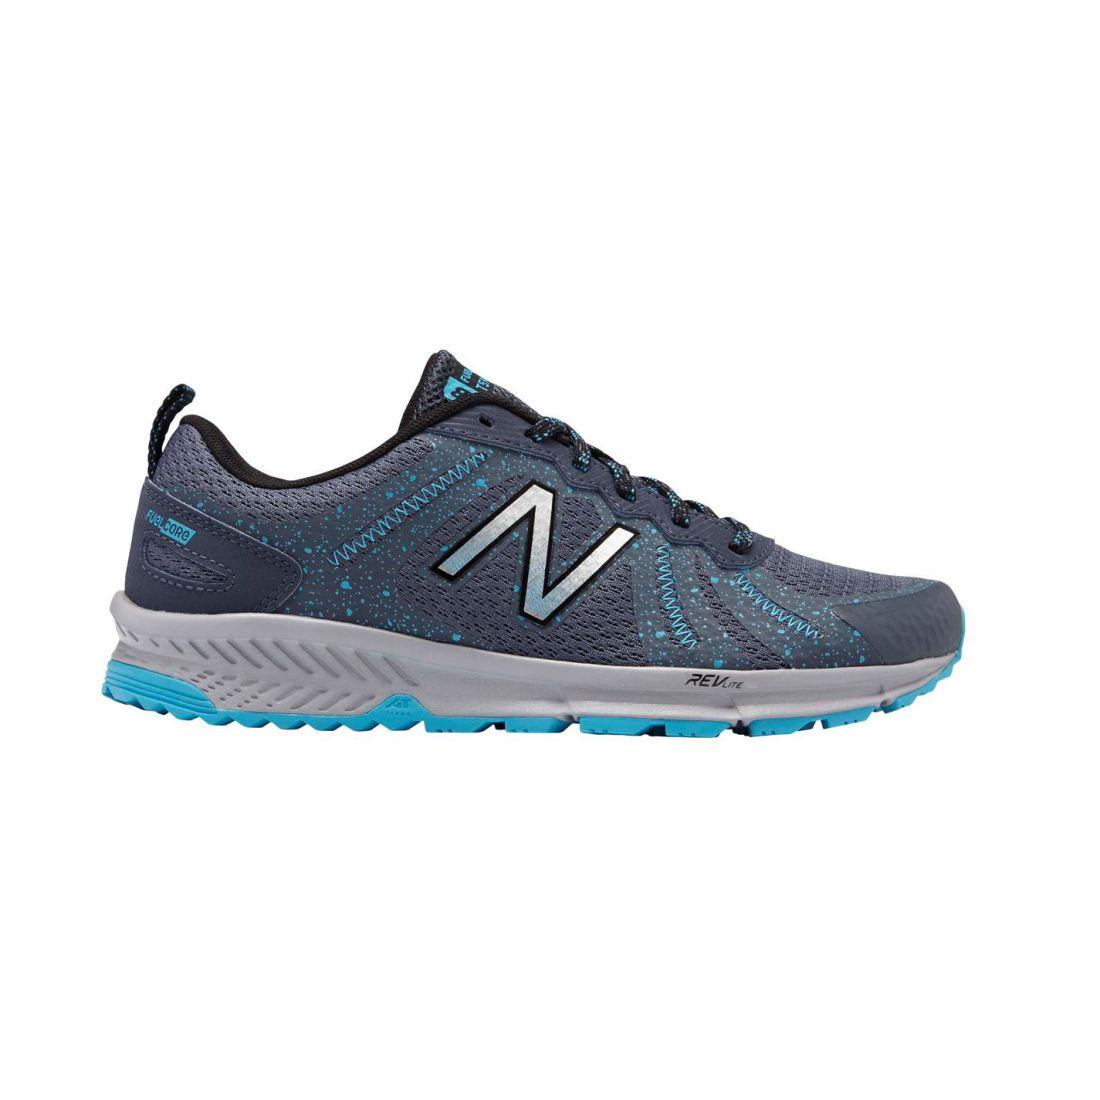 New Balance Femme WT590v4 Trail Running chaussures